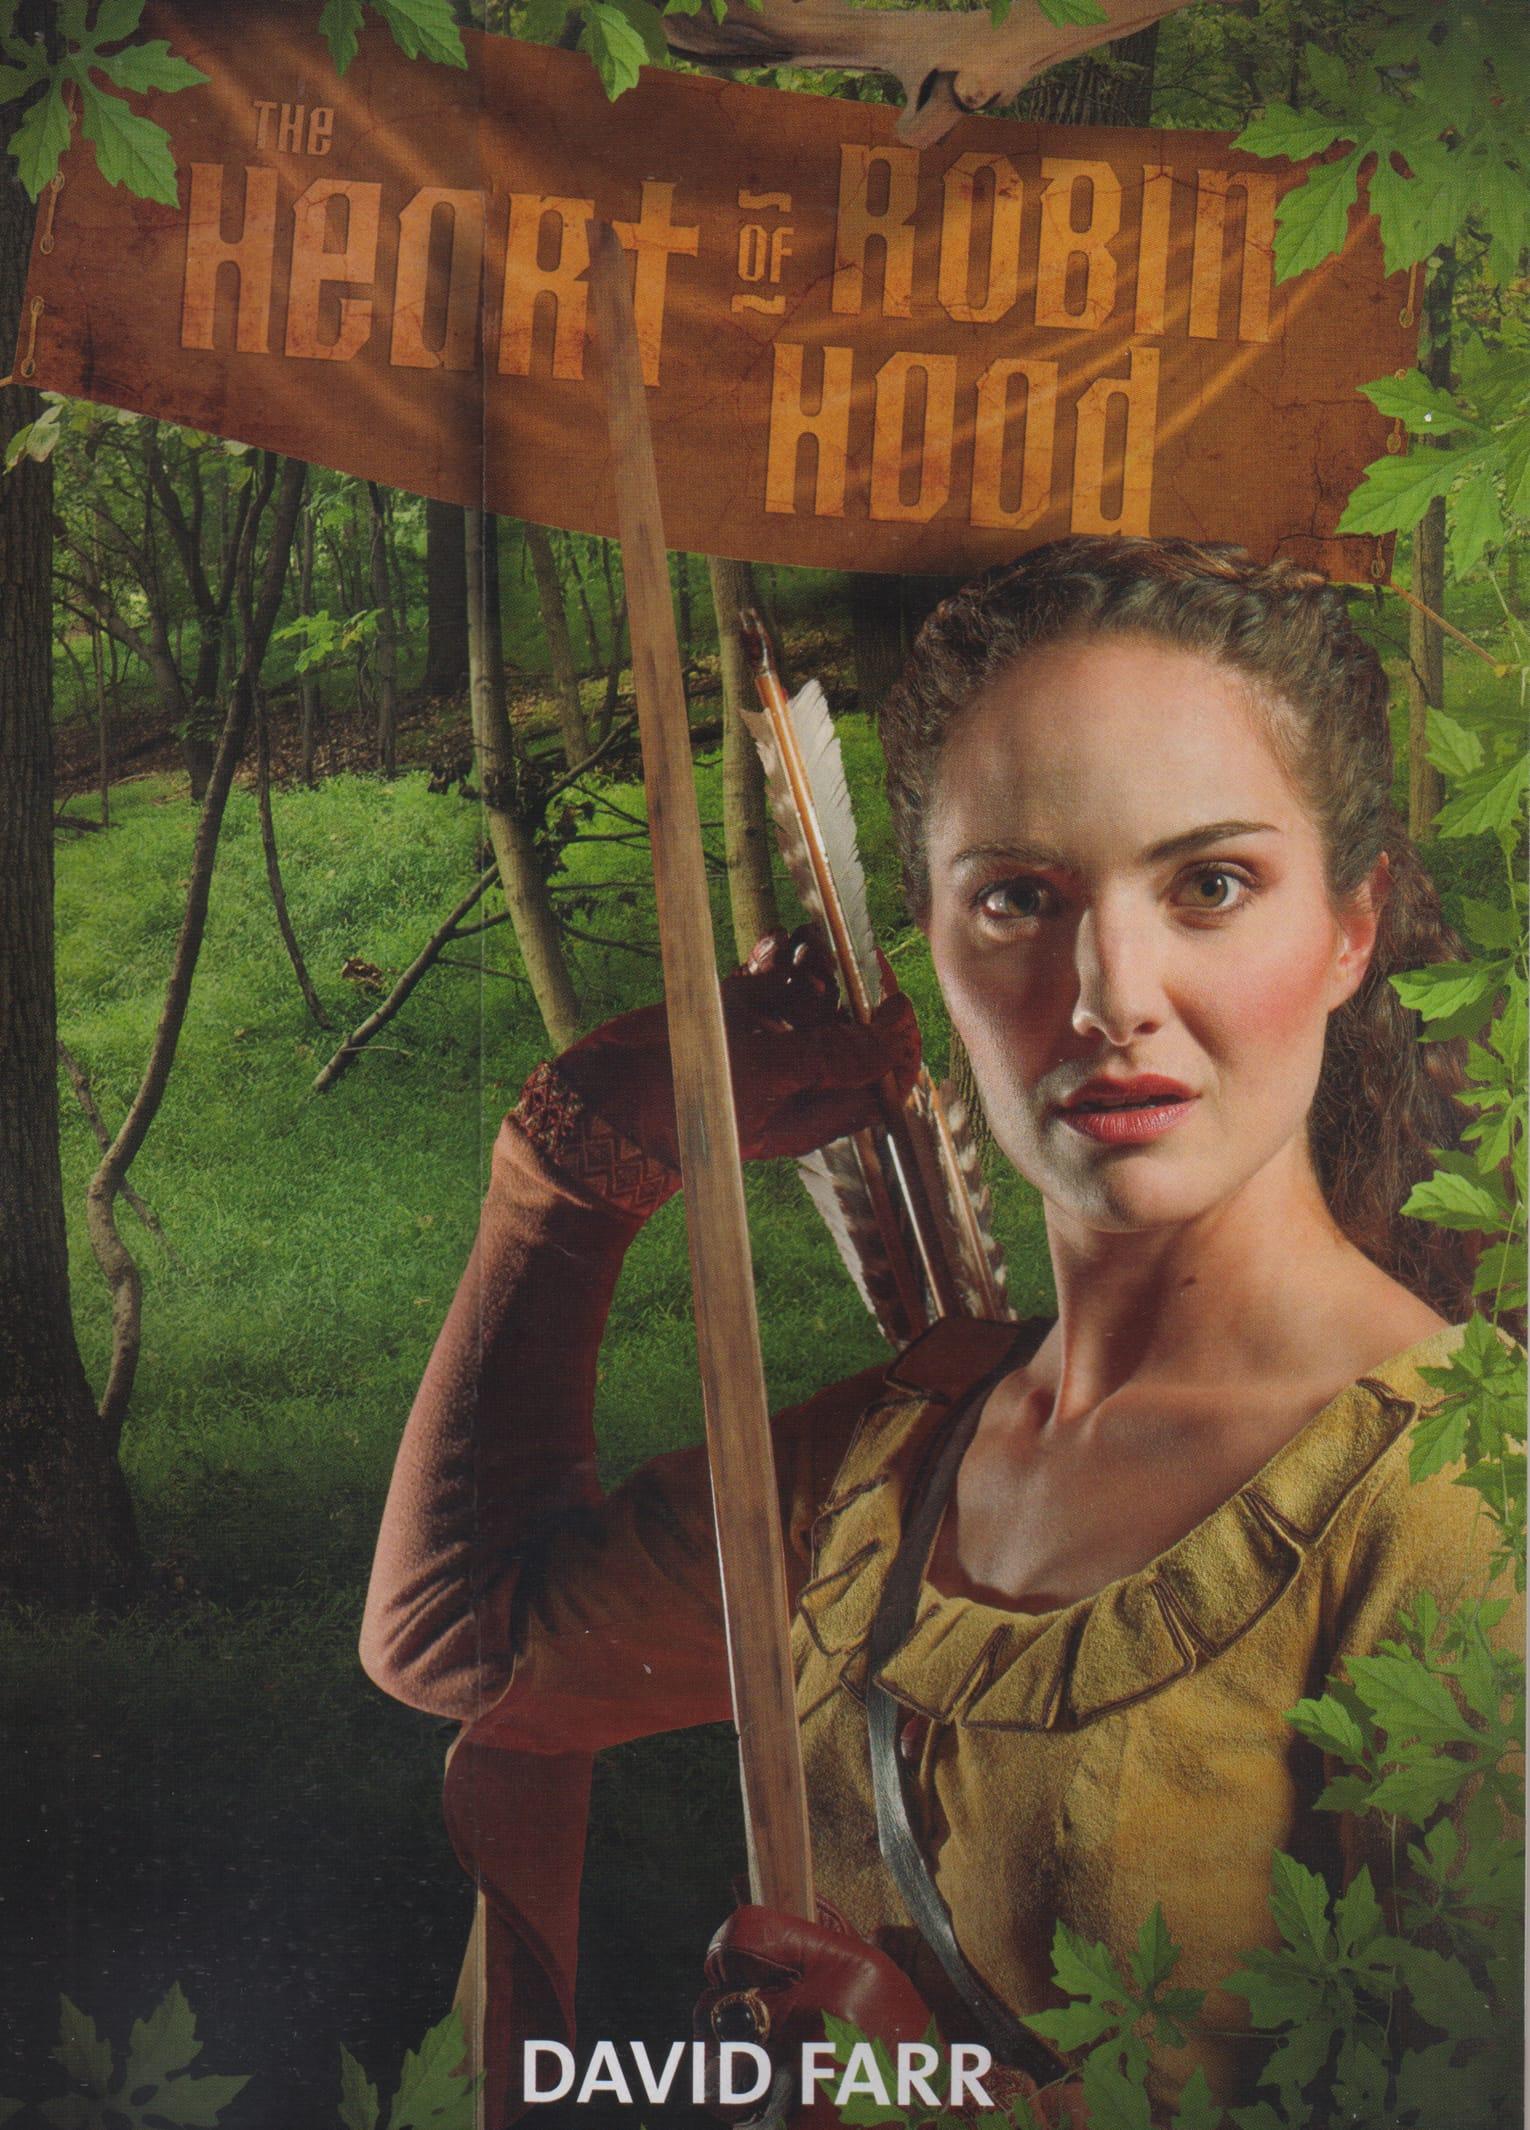 OSF 2013 The Heart of Robin Hood